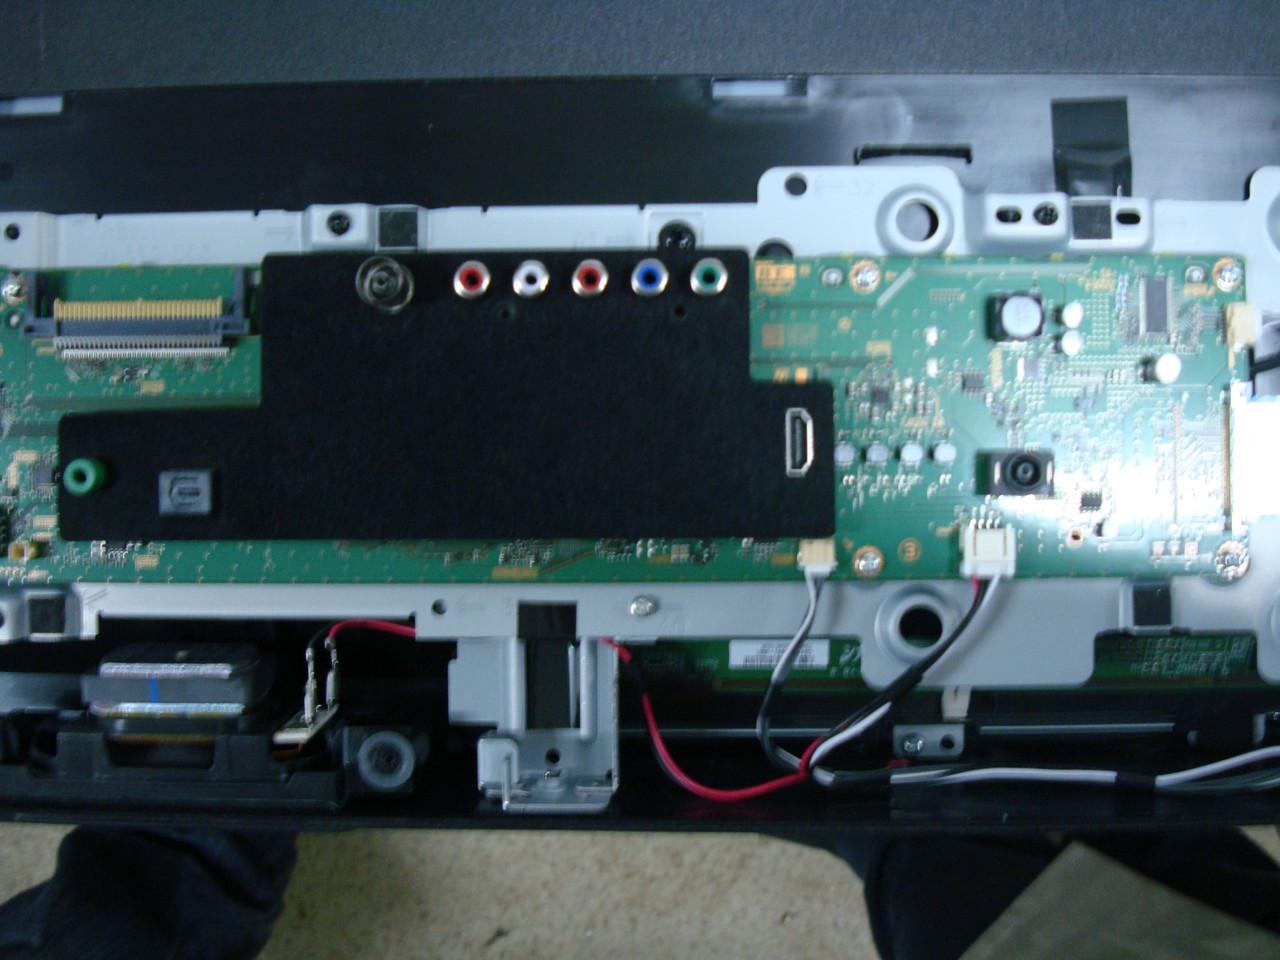 Запчастини до телевізора Sony KDL-40R353C ( LSY400HN01-A03, 1-893-522-11)